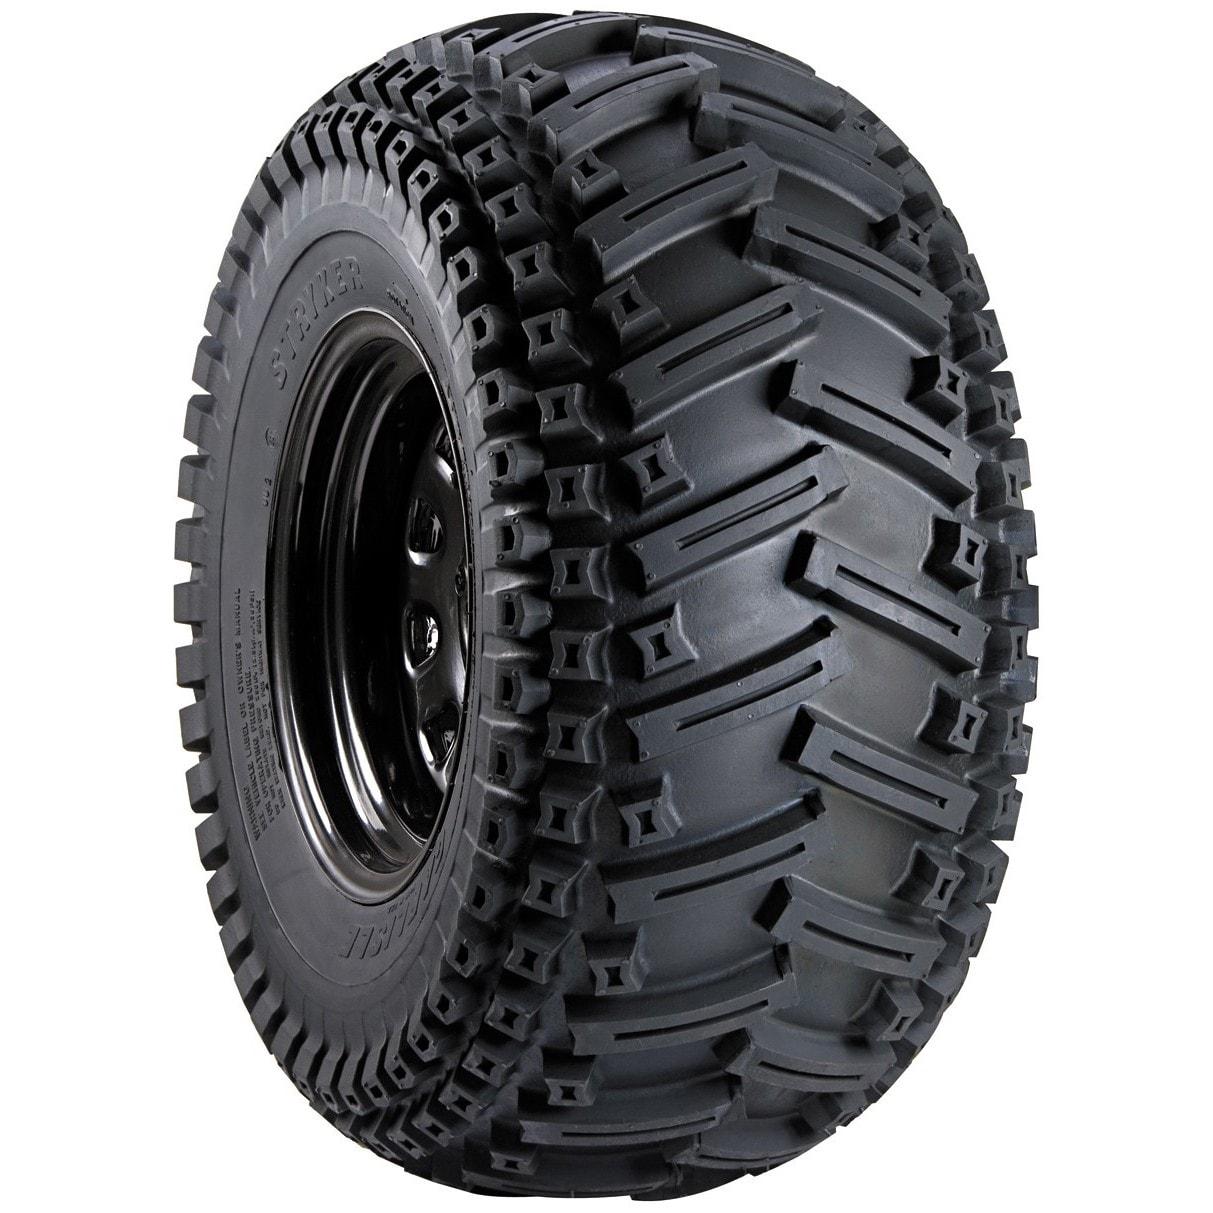 Carlisle Stryker ATV Tire - 22X11-8 2* (Black)